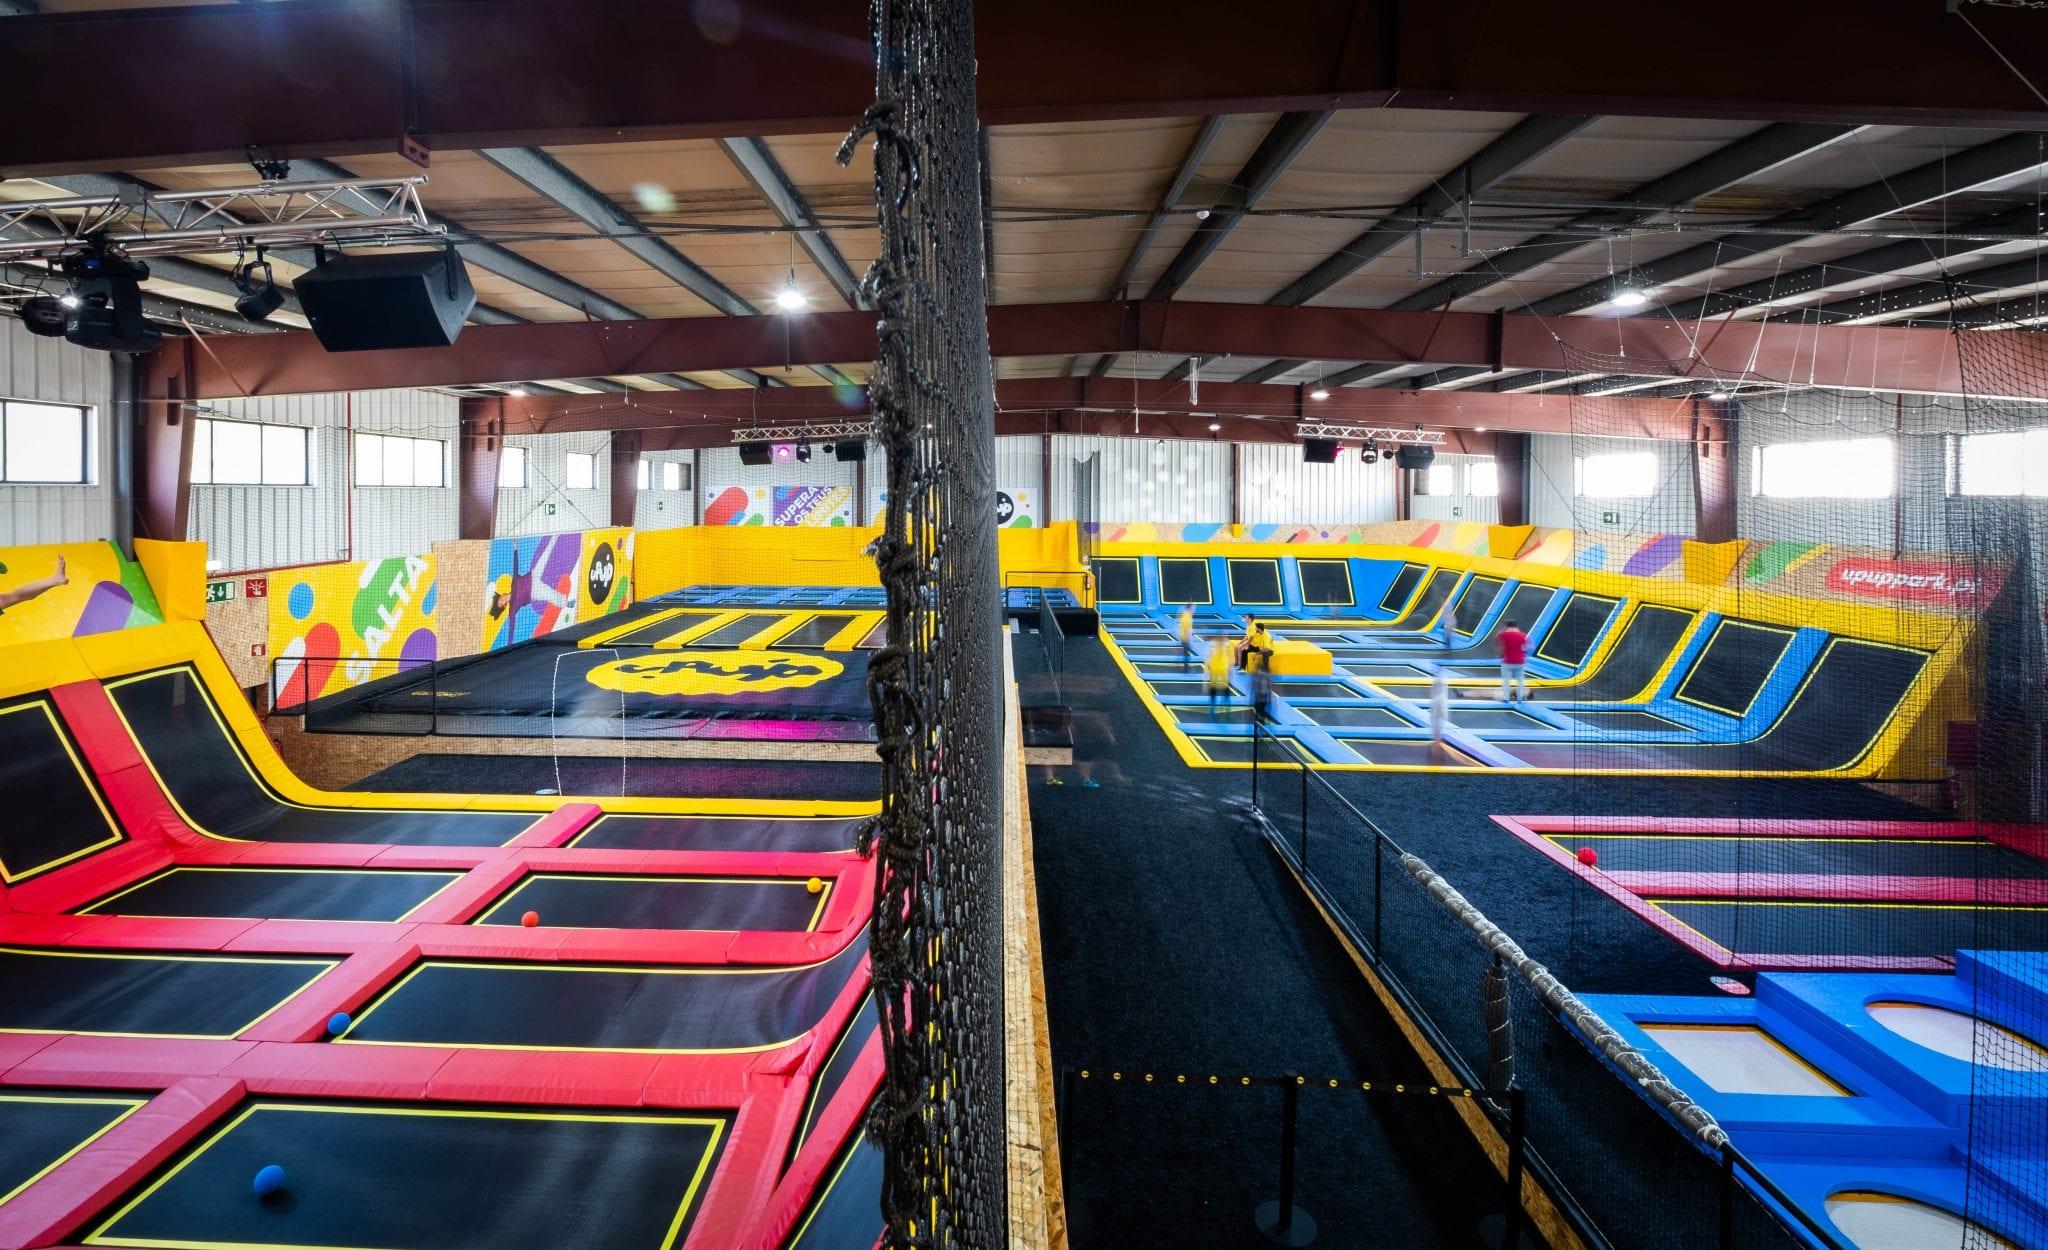 trampolins lisboa - upup park